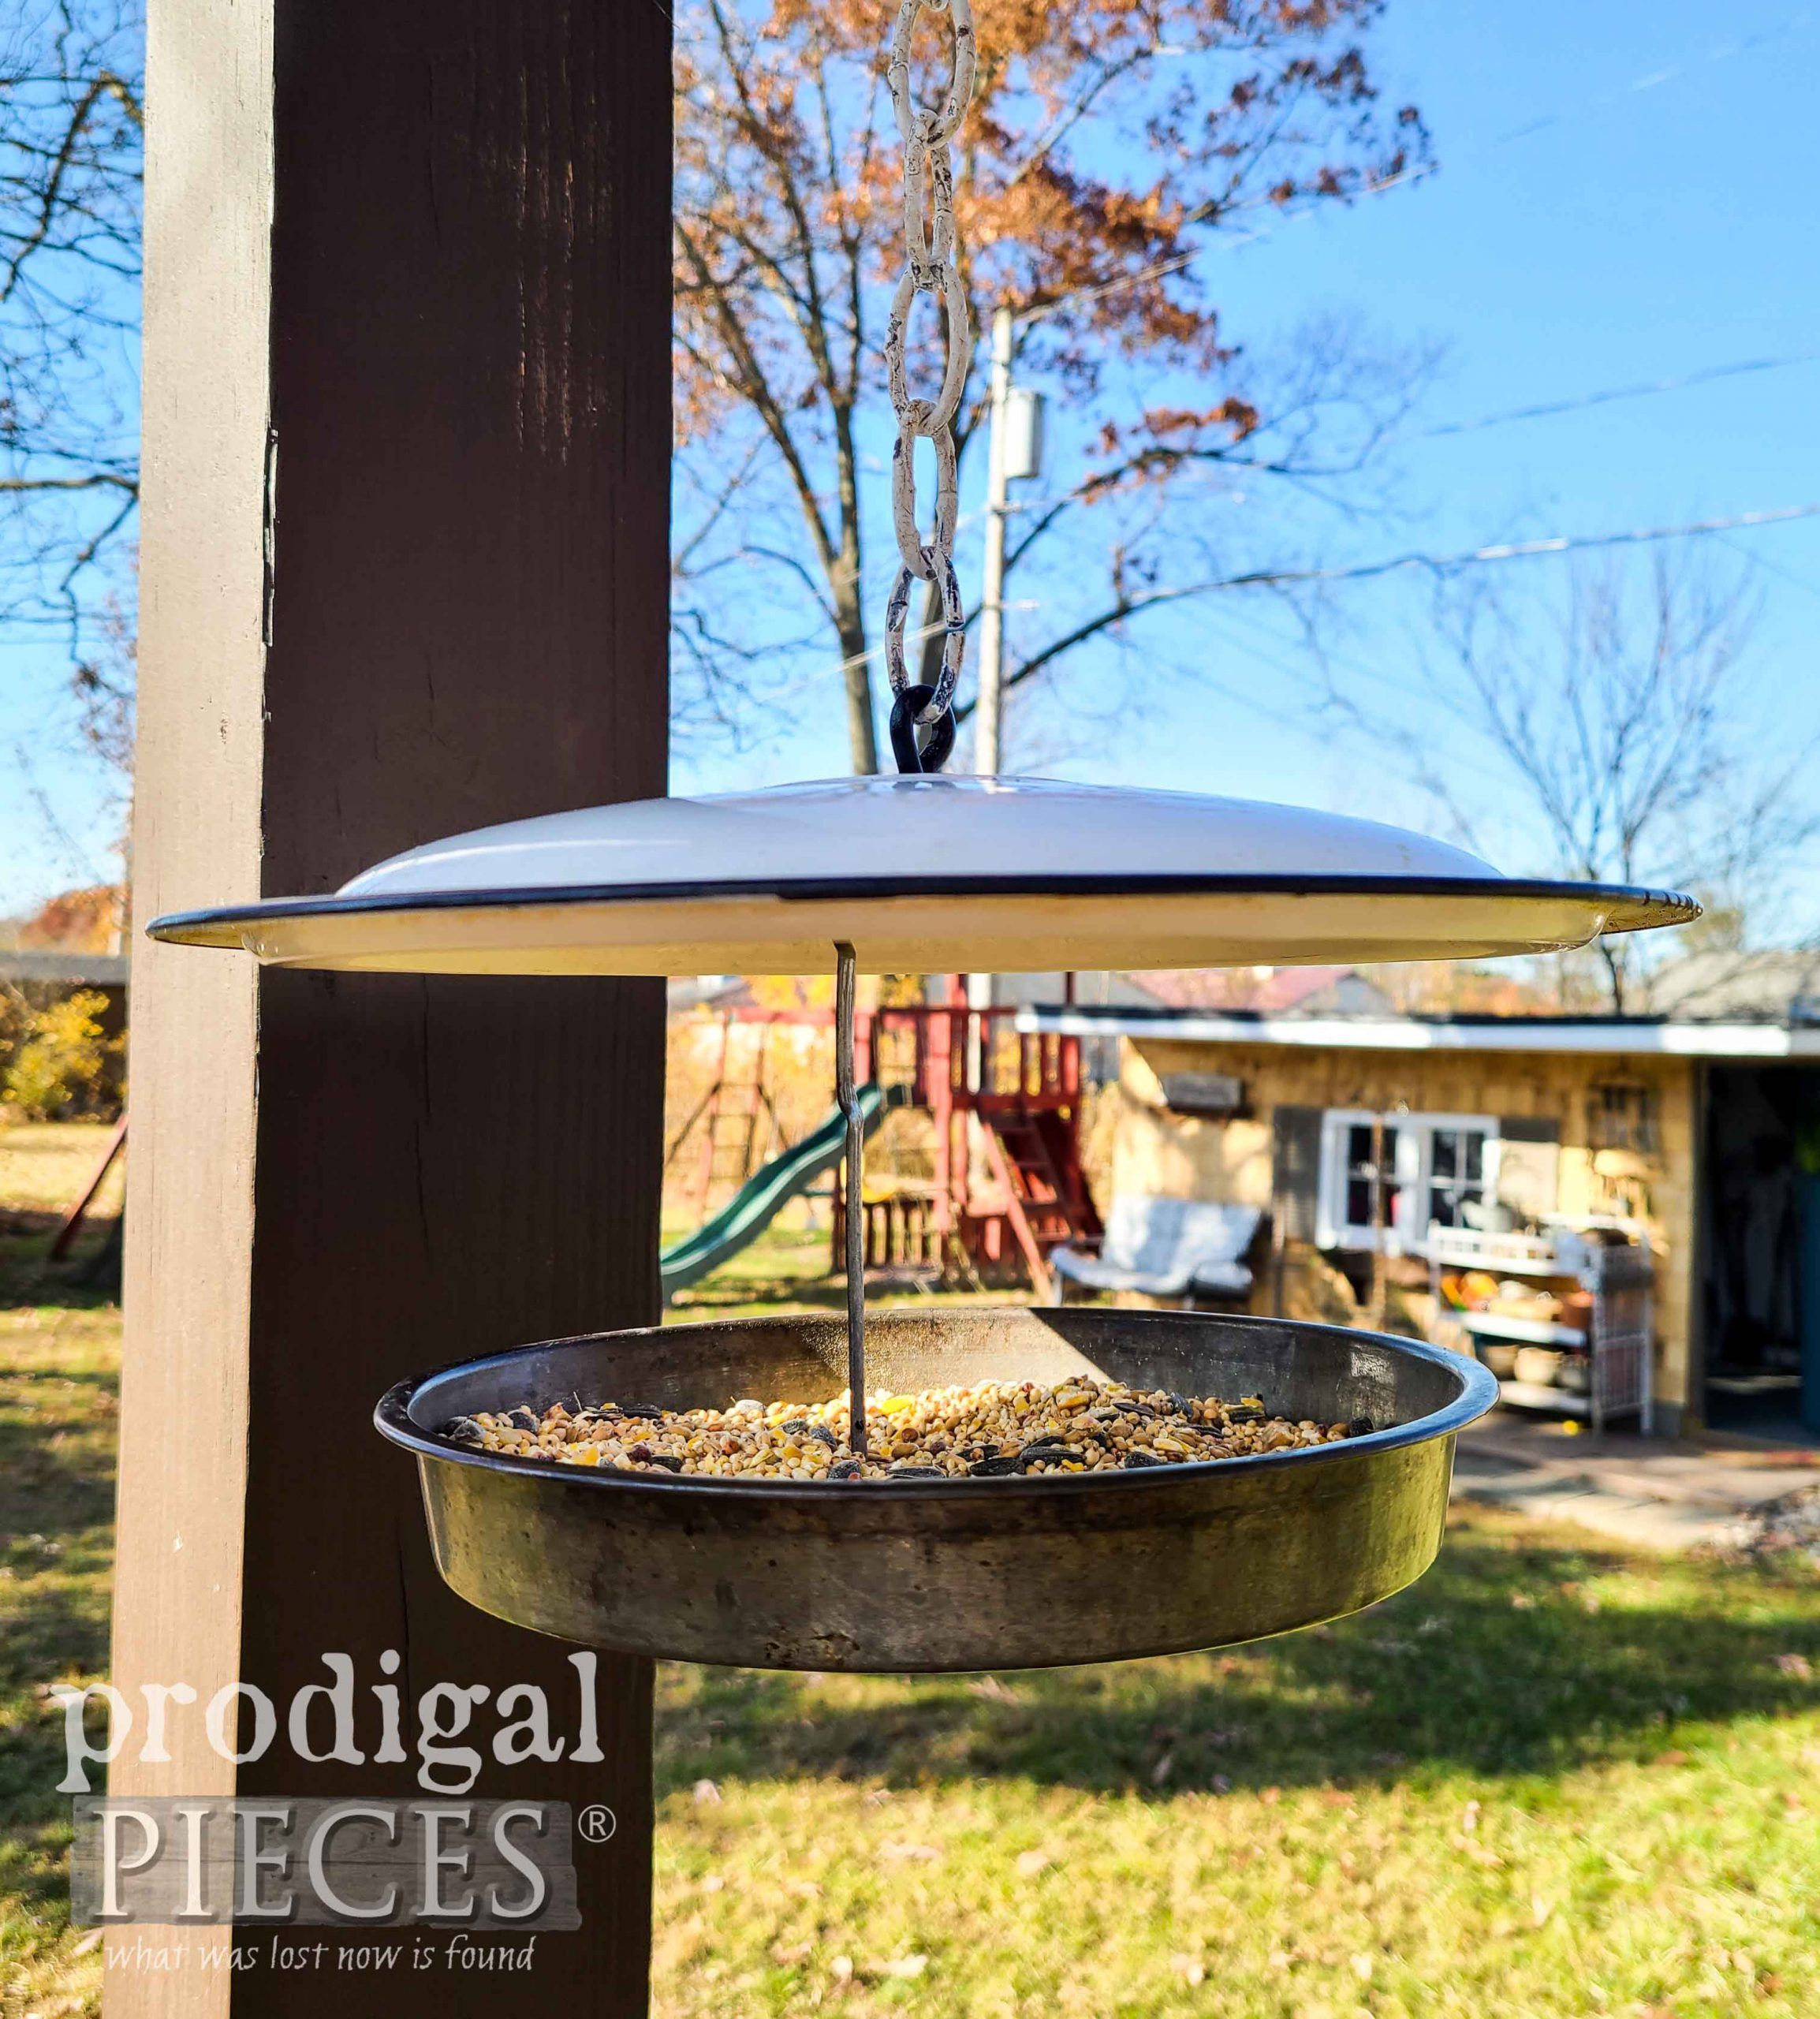 White Enamel Pot Lid Upcycled Bird Feeder by Larissa of Prodigal Pieces | prodigalpieces.com #prodigalpieces #garden #birdfeeder #home #diy